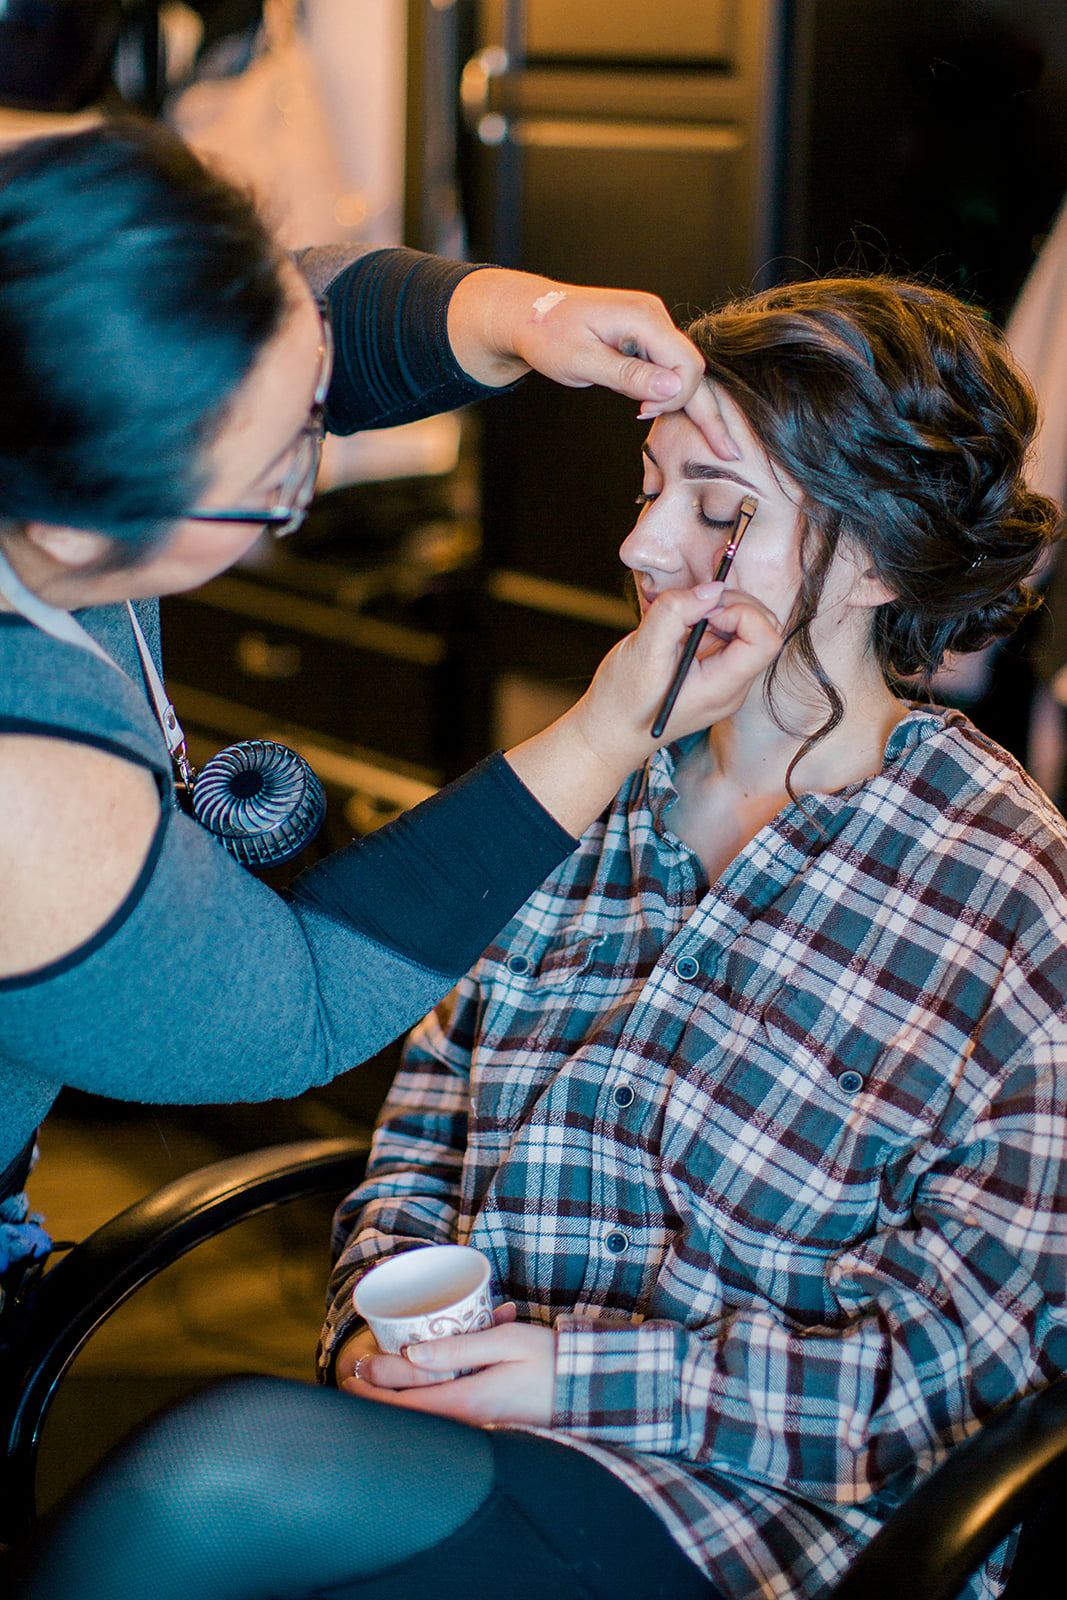 Royal Cliff Styled Shoot photo by Rachel Graff Photography   behind the scenes Miranda Art makeup artist